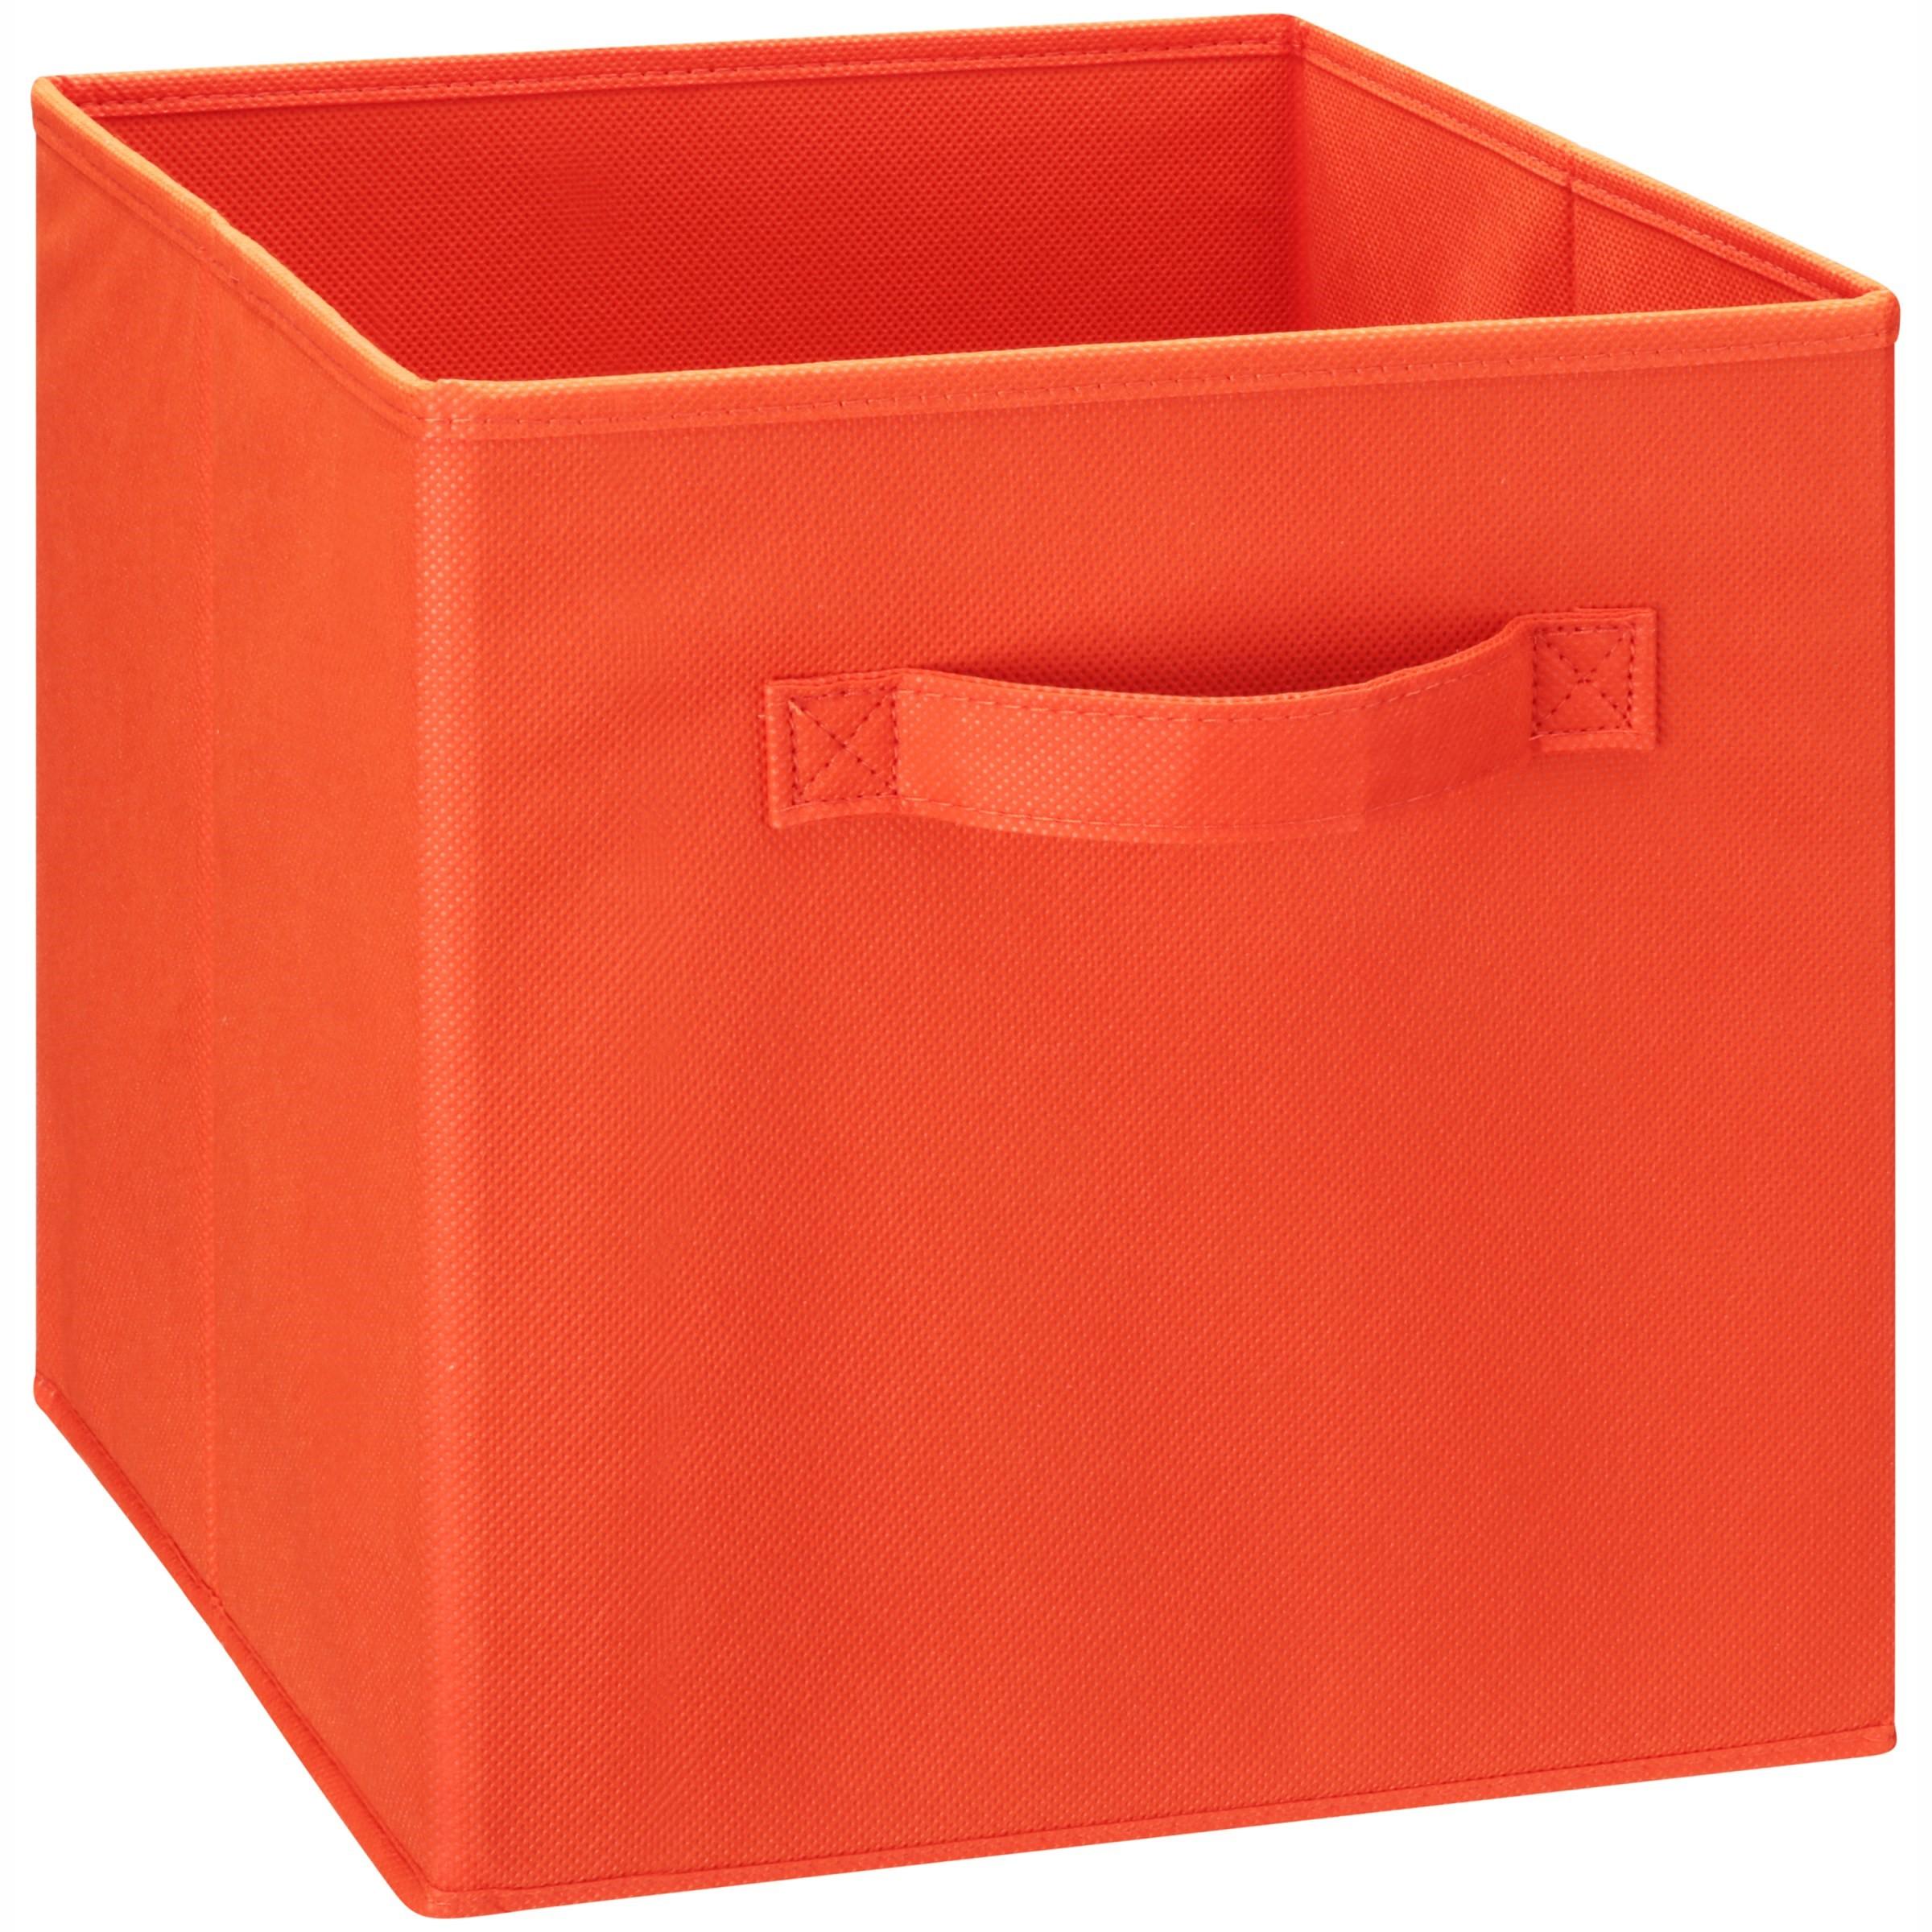 ClosetMaid® Cubeicals® Sunset Fabric Drawer